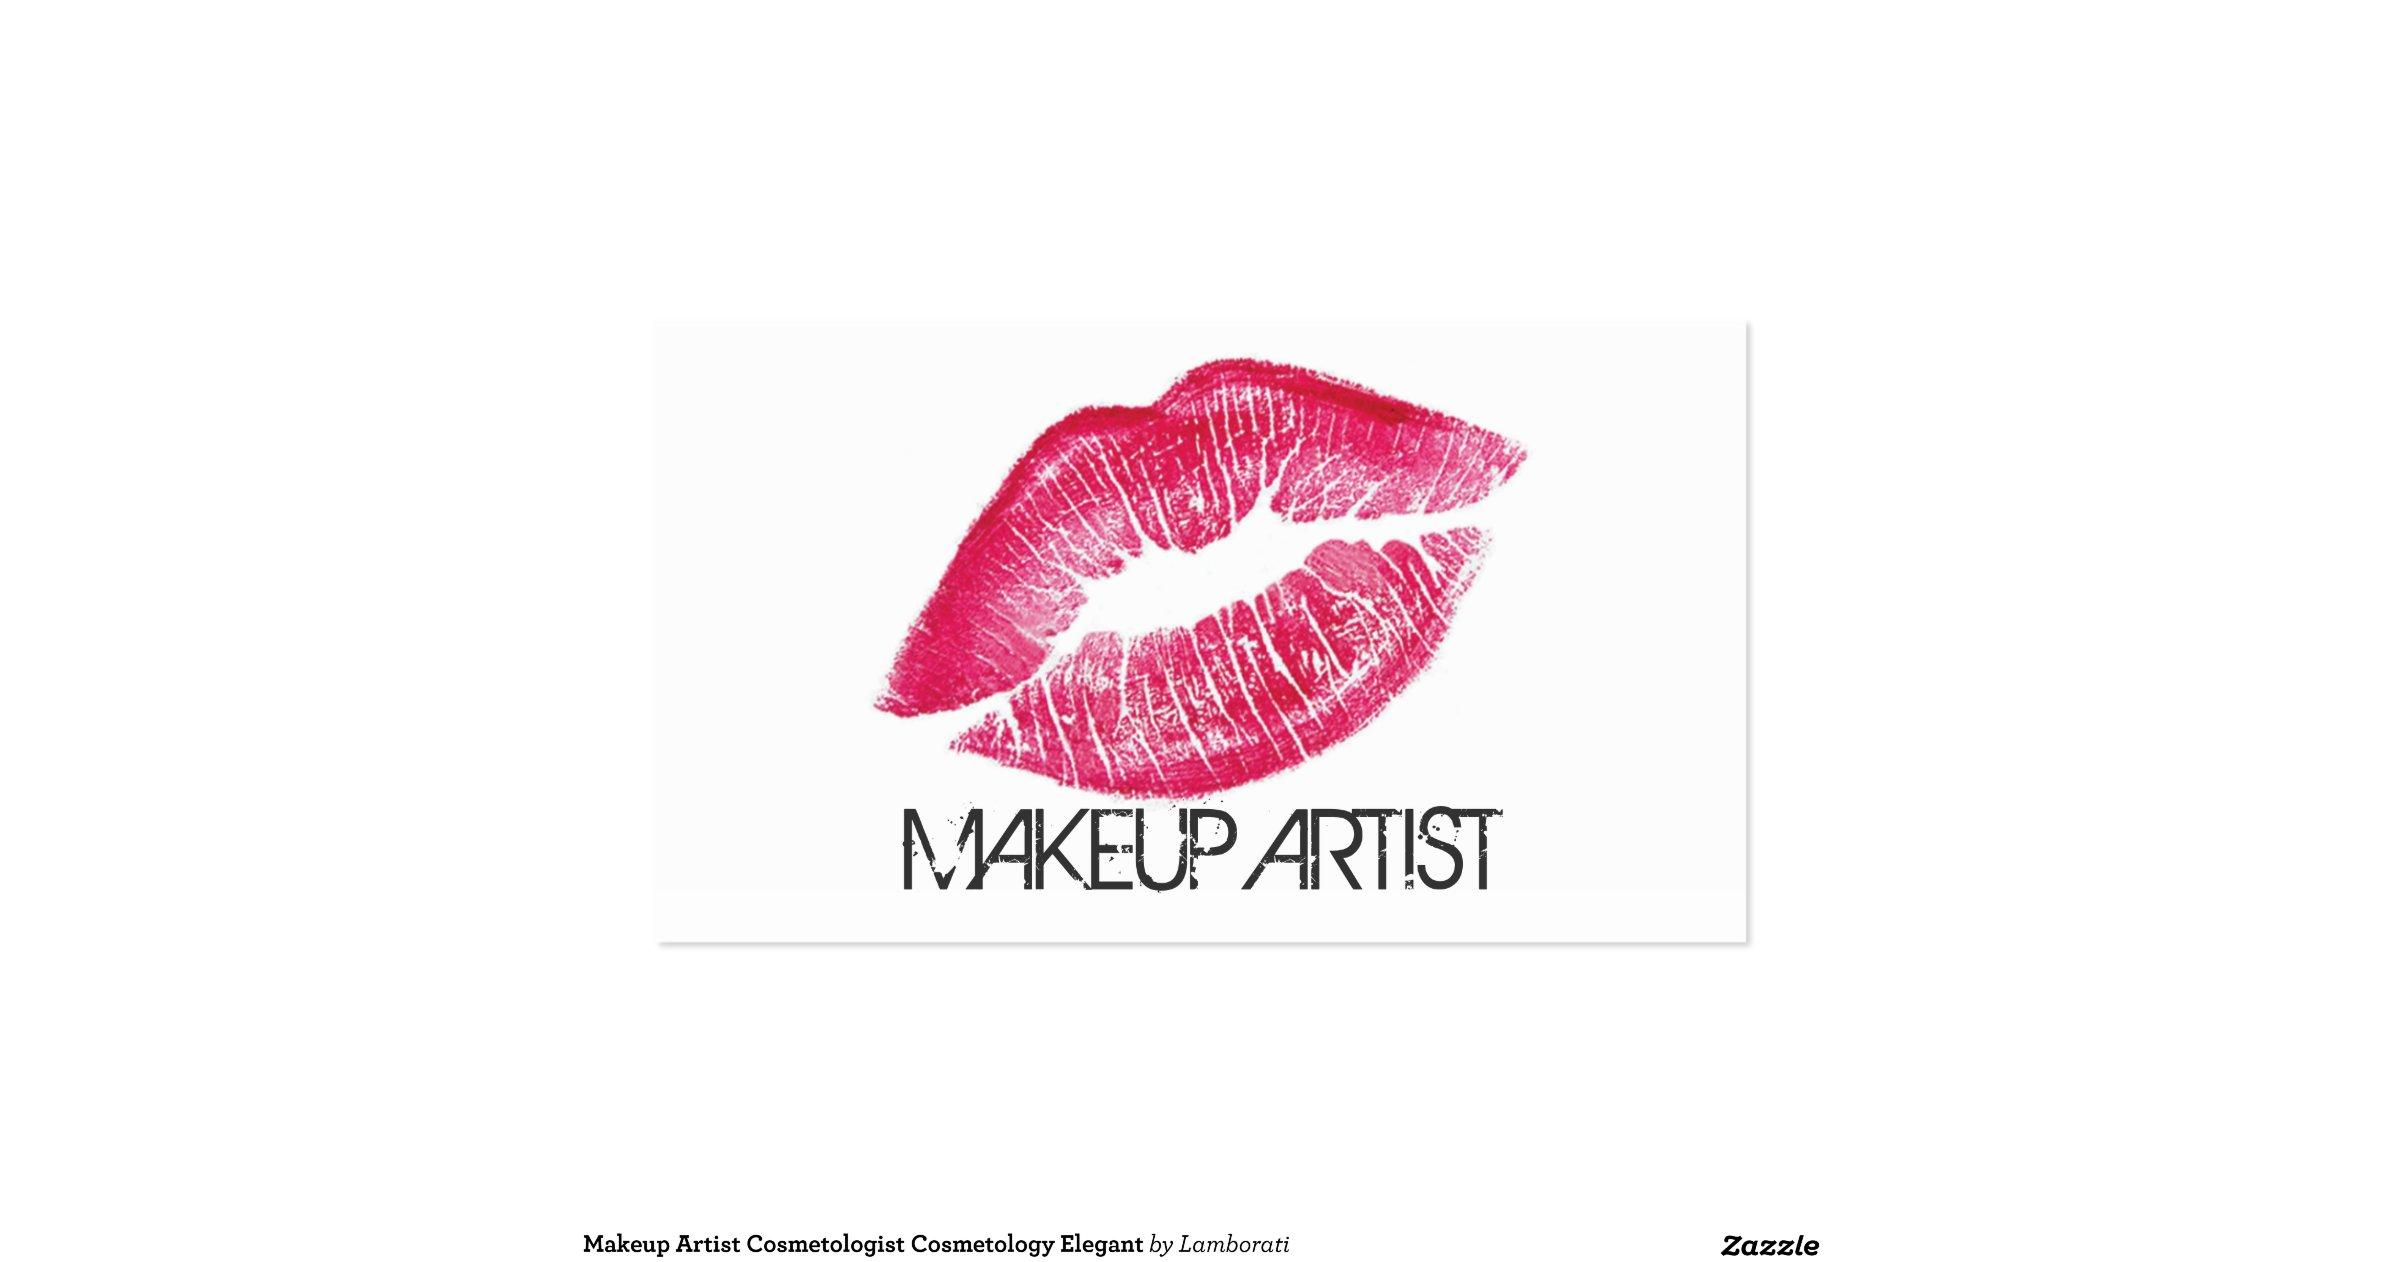 Makeup Artist Fonts images